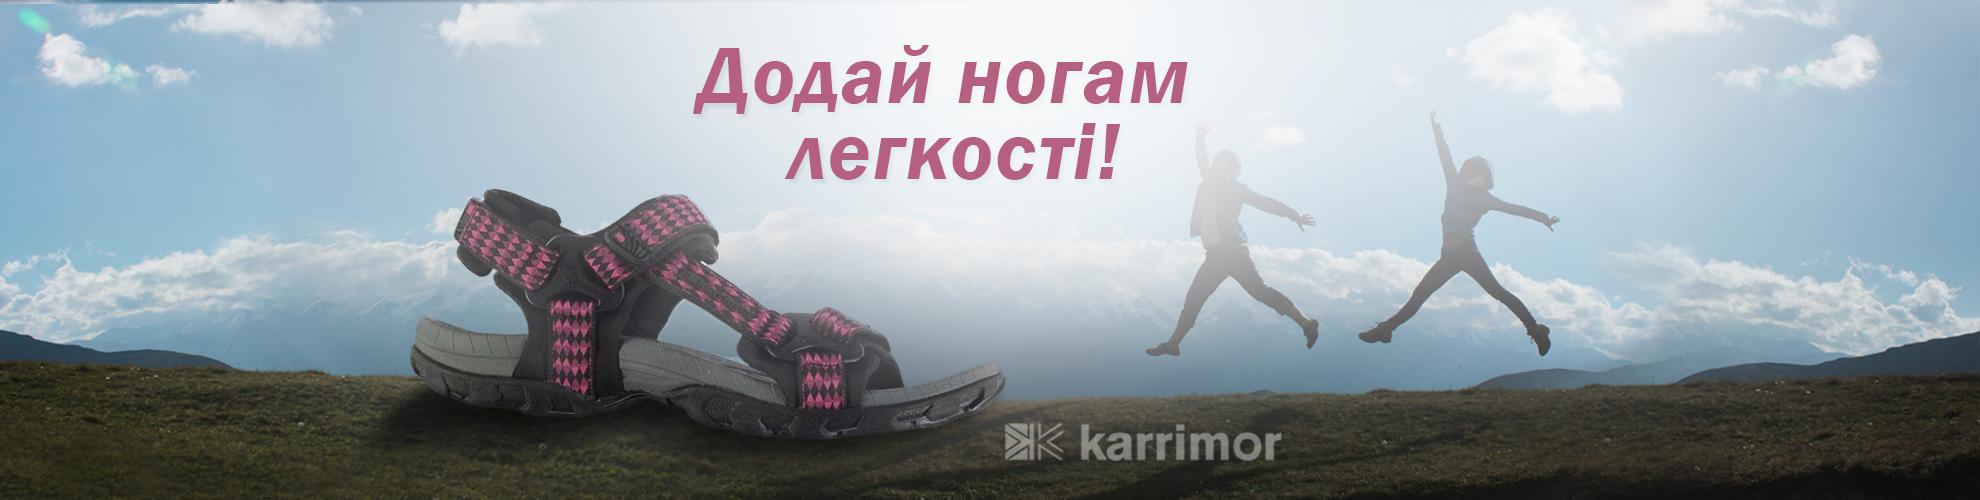 sandali_amazon_wm_ua